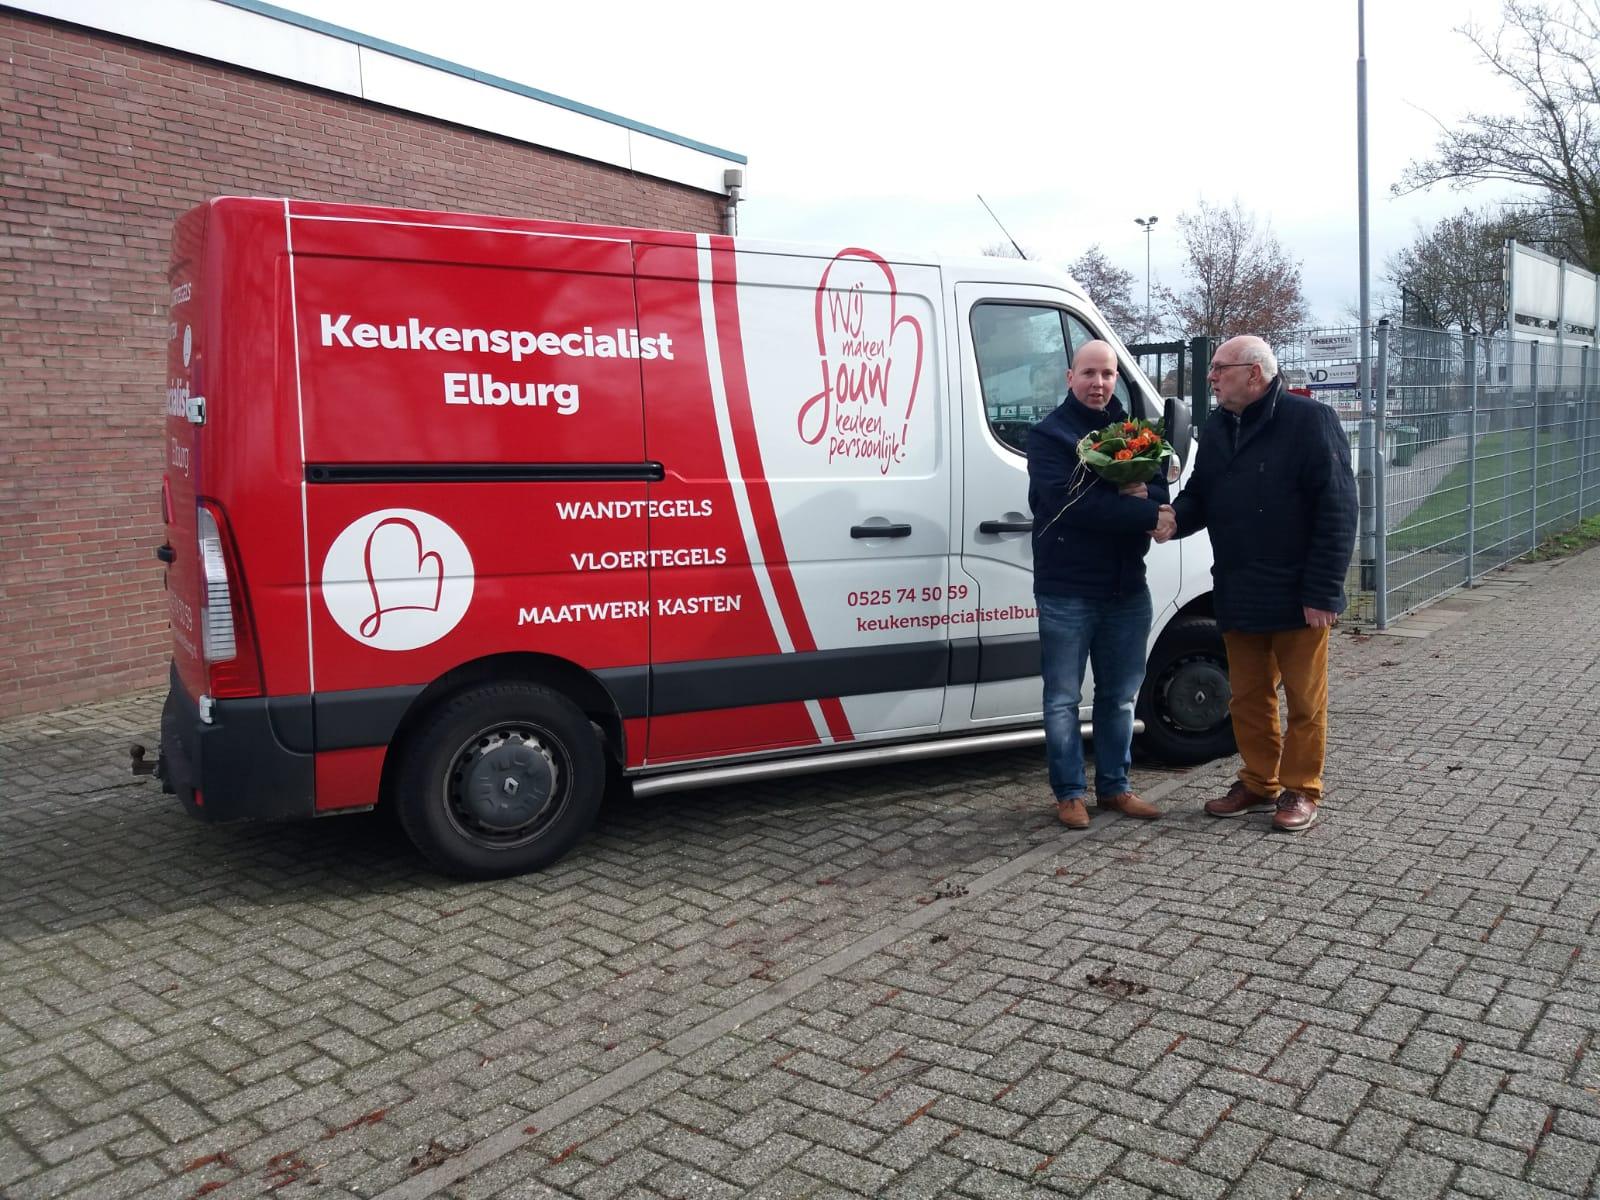 Keukenspecialist Elburg nieuwe bordsponsor - Elburger SC